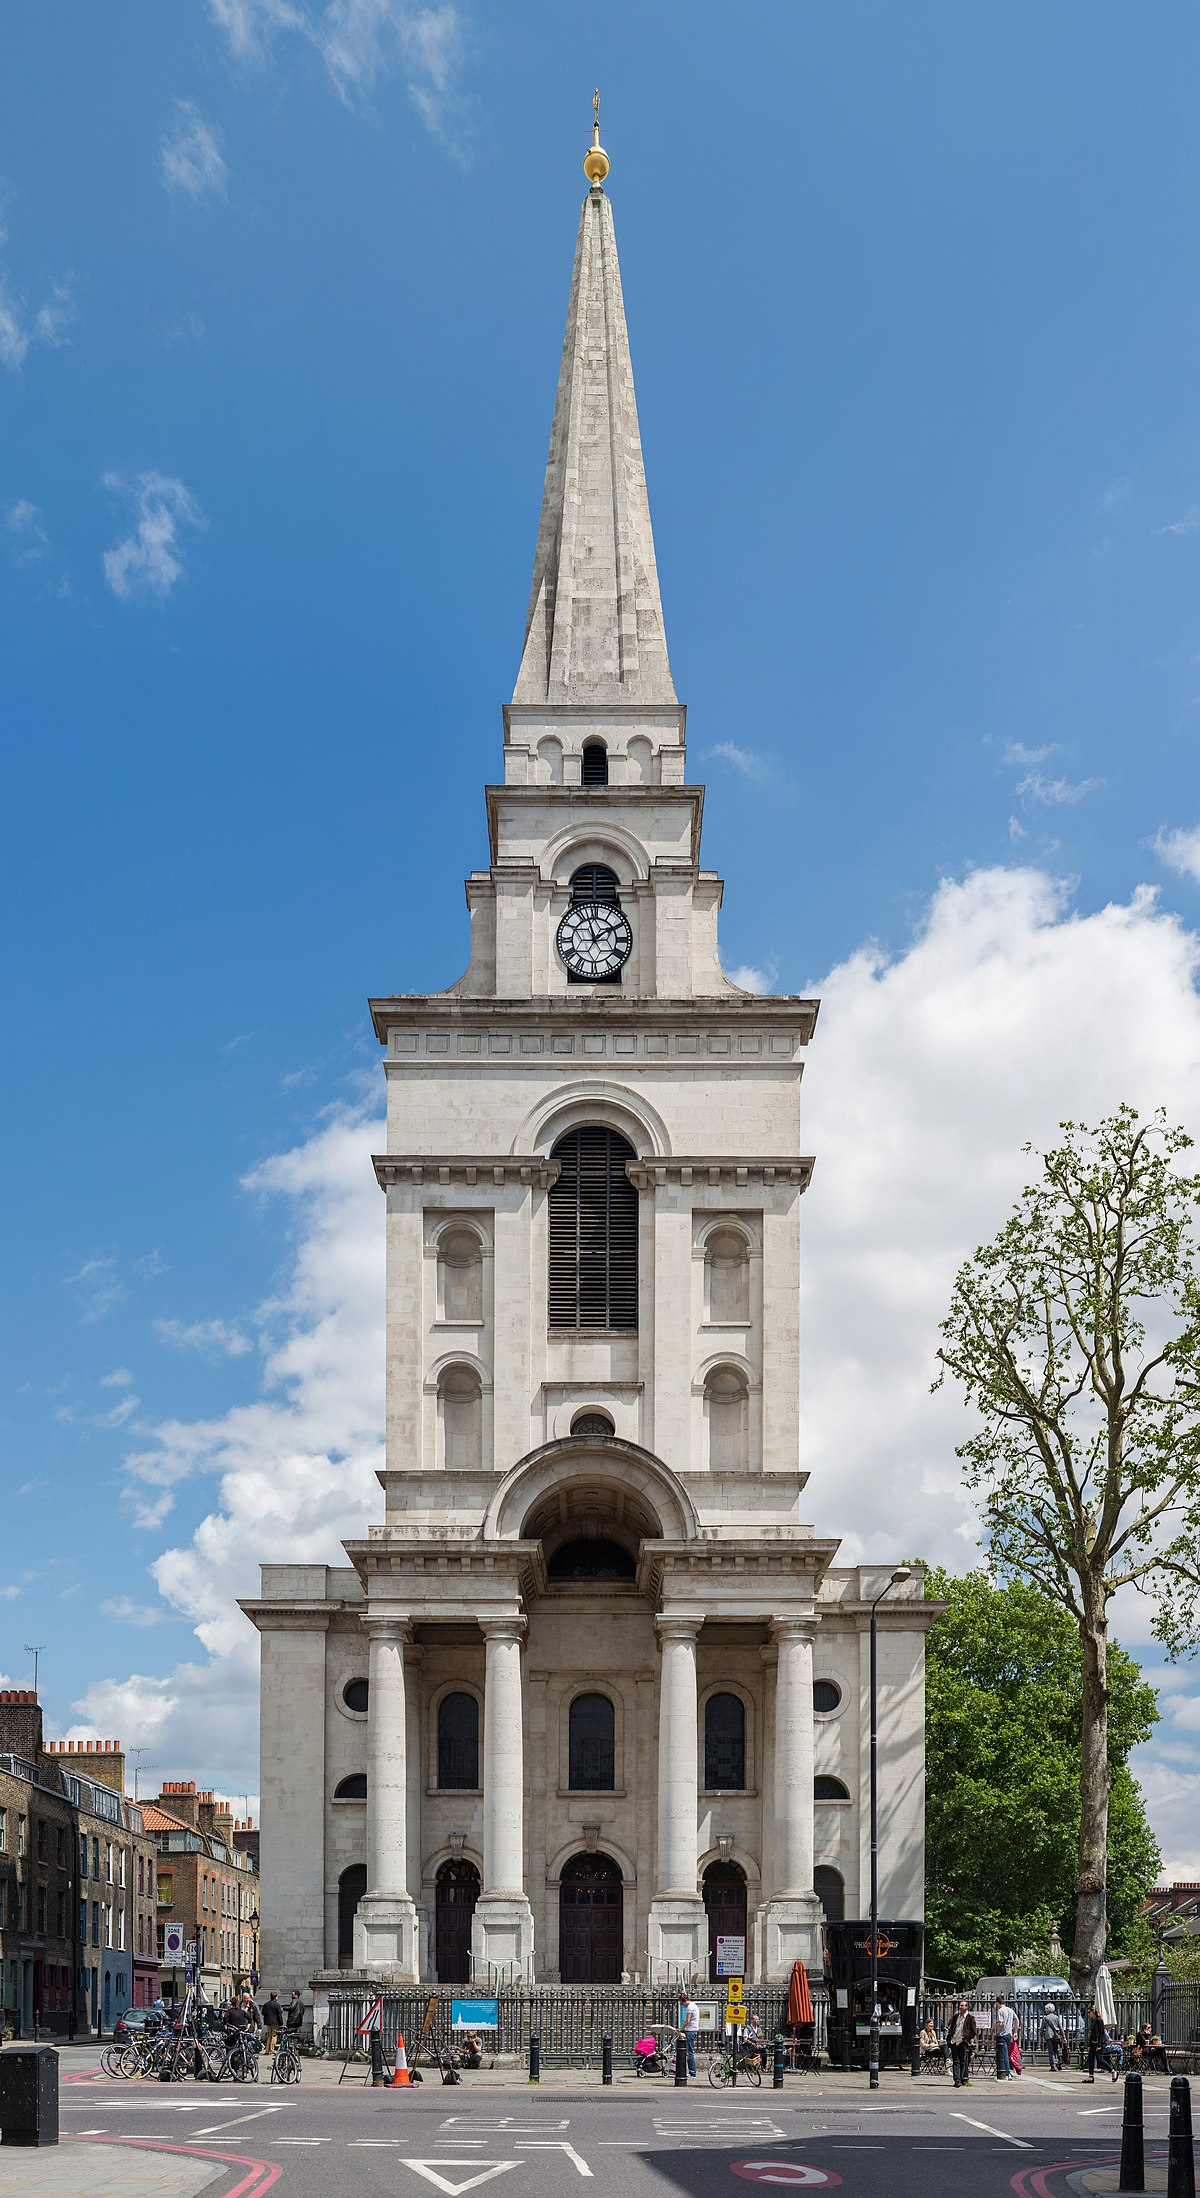 East End London: Christ Church, Spitalfields